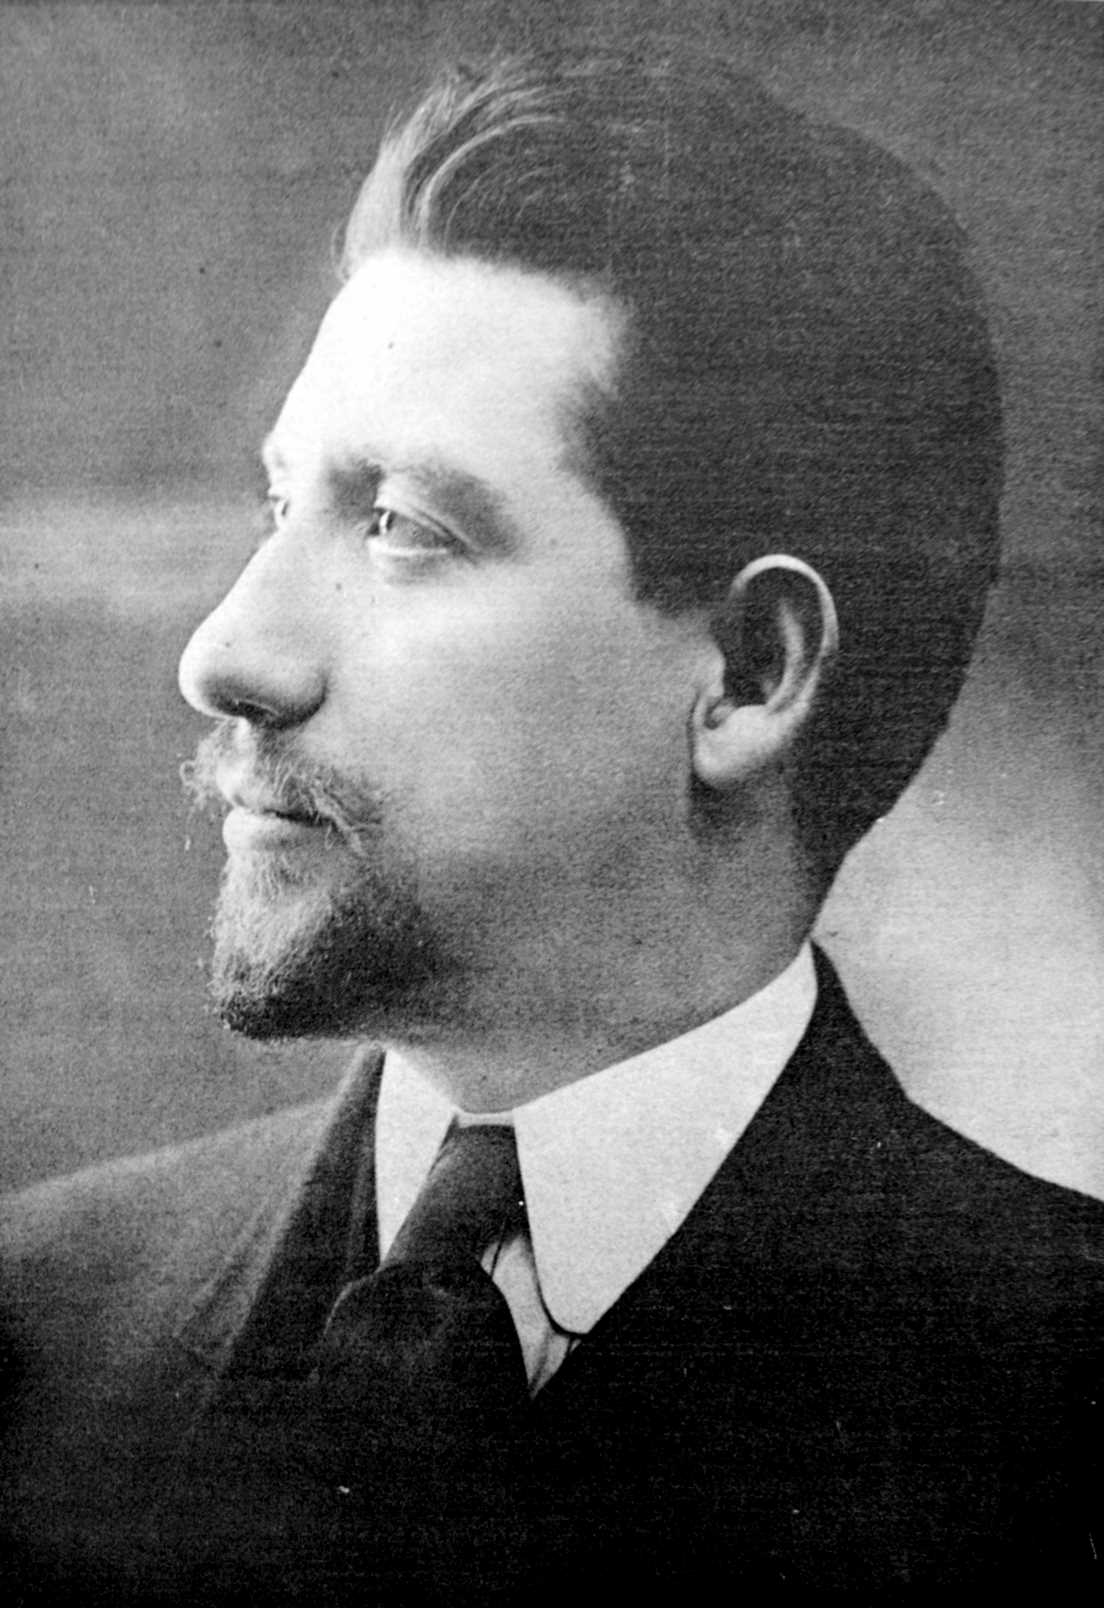 Carlo Tresca fotografiat per V. Bellino (Filadèlfia, 1910)